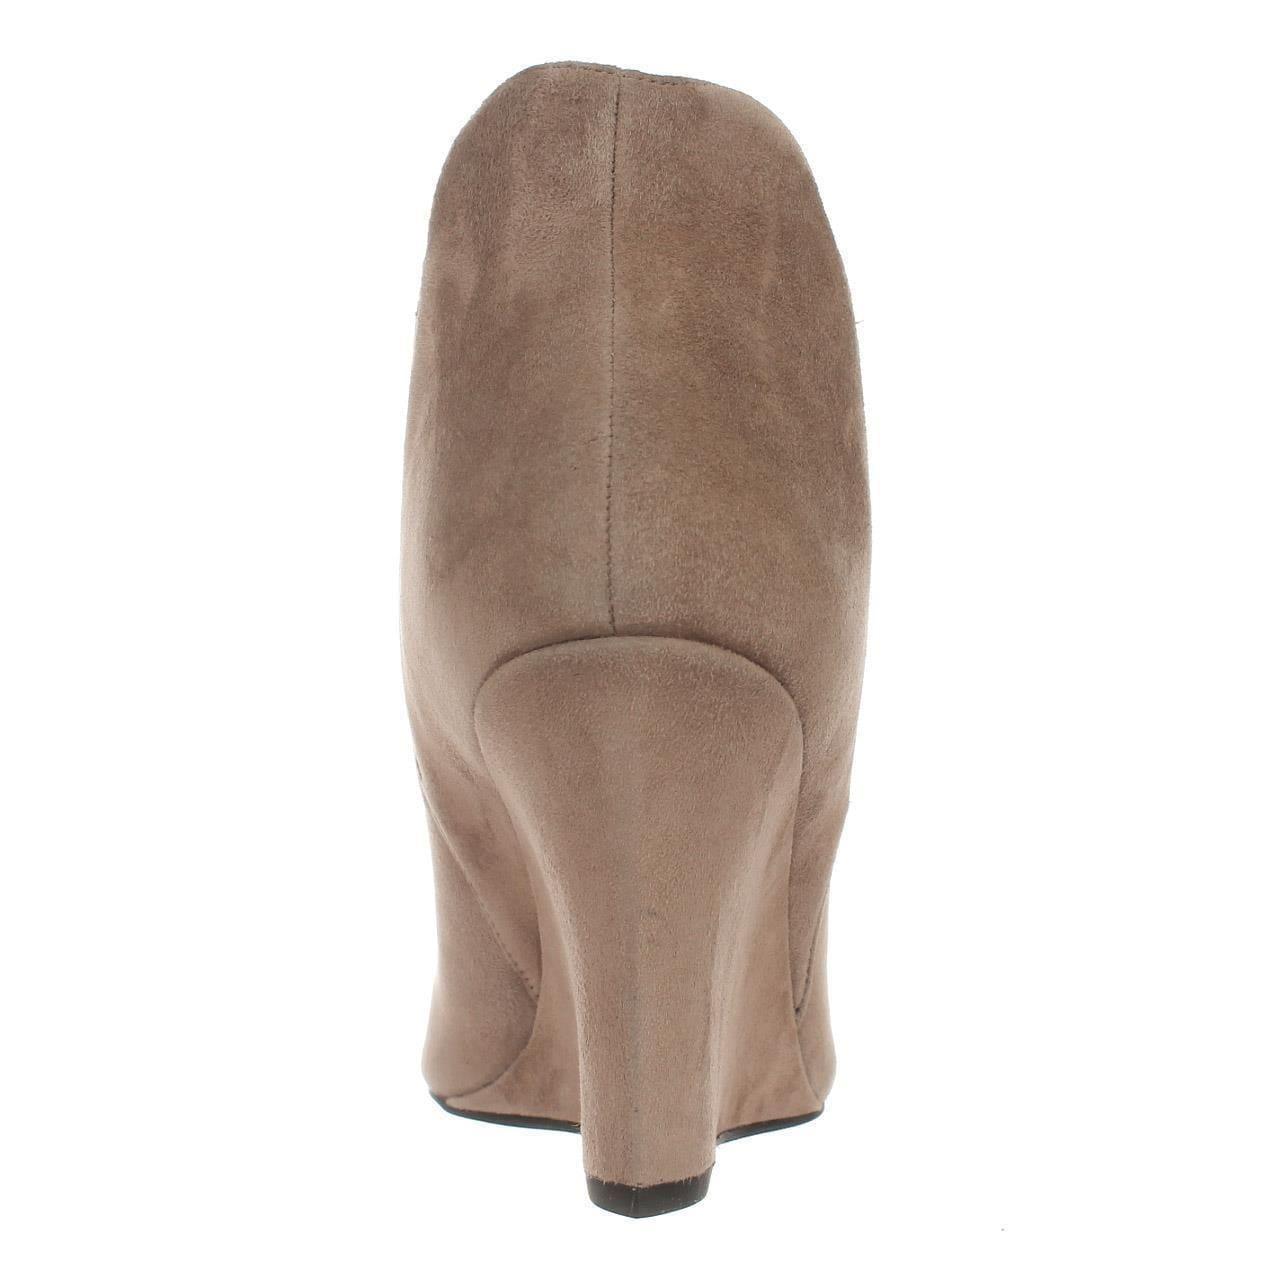 3f59062872d Shop Via Spiga Kenzie Wedge Ankle Booties